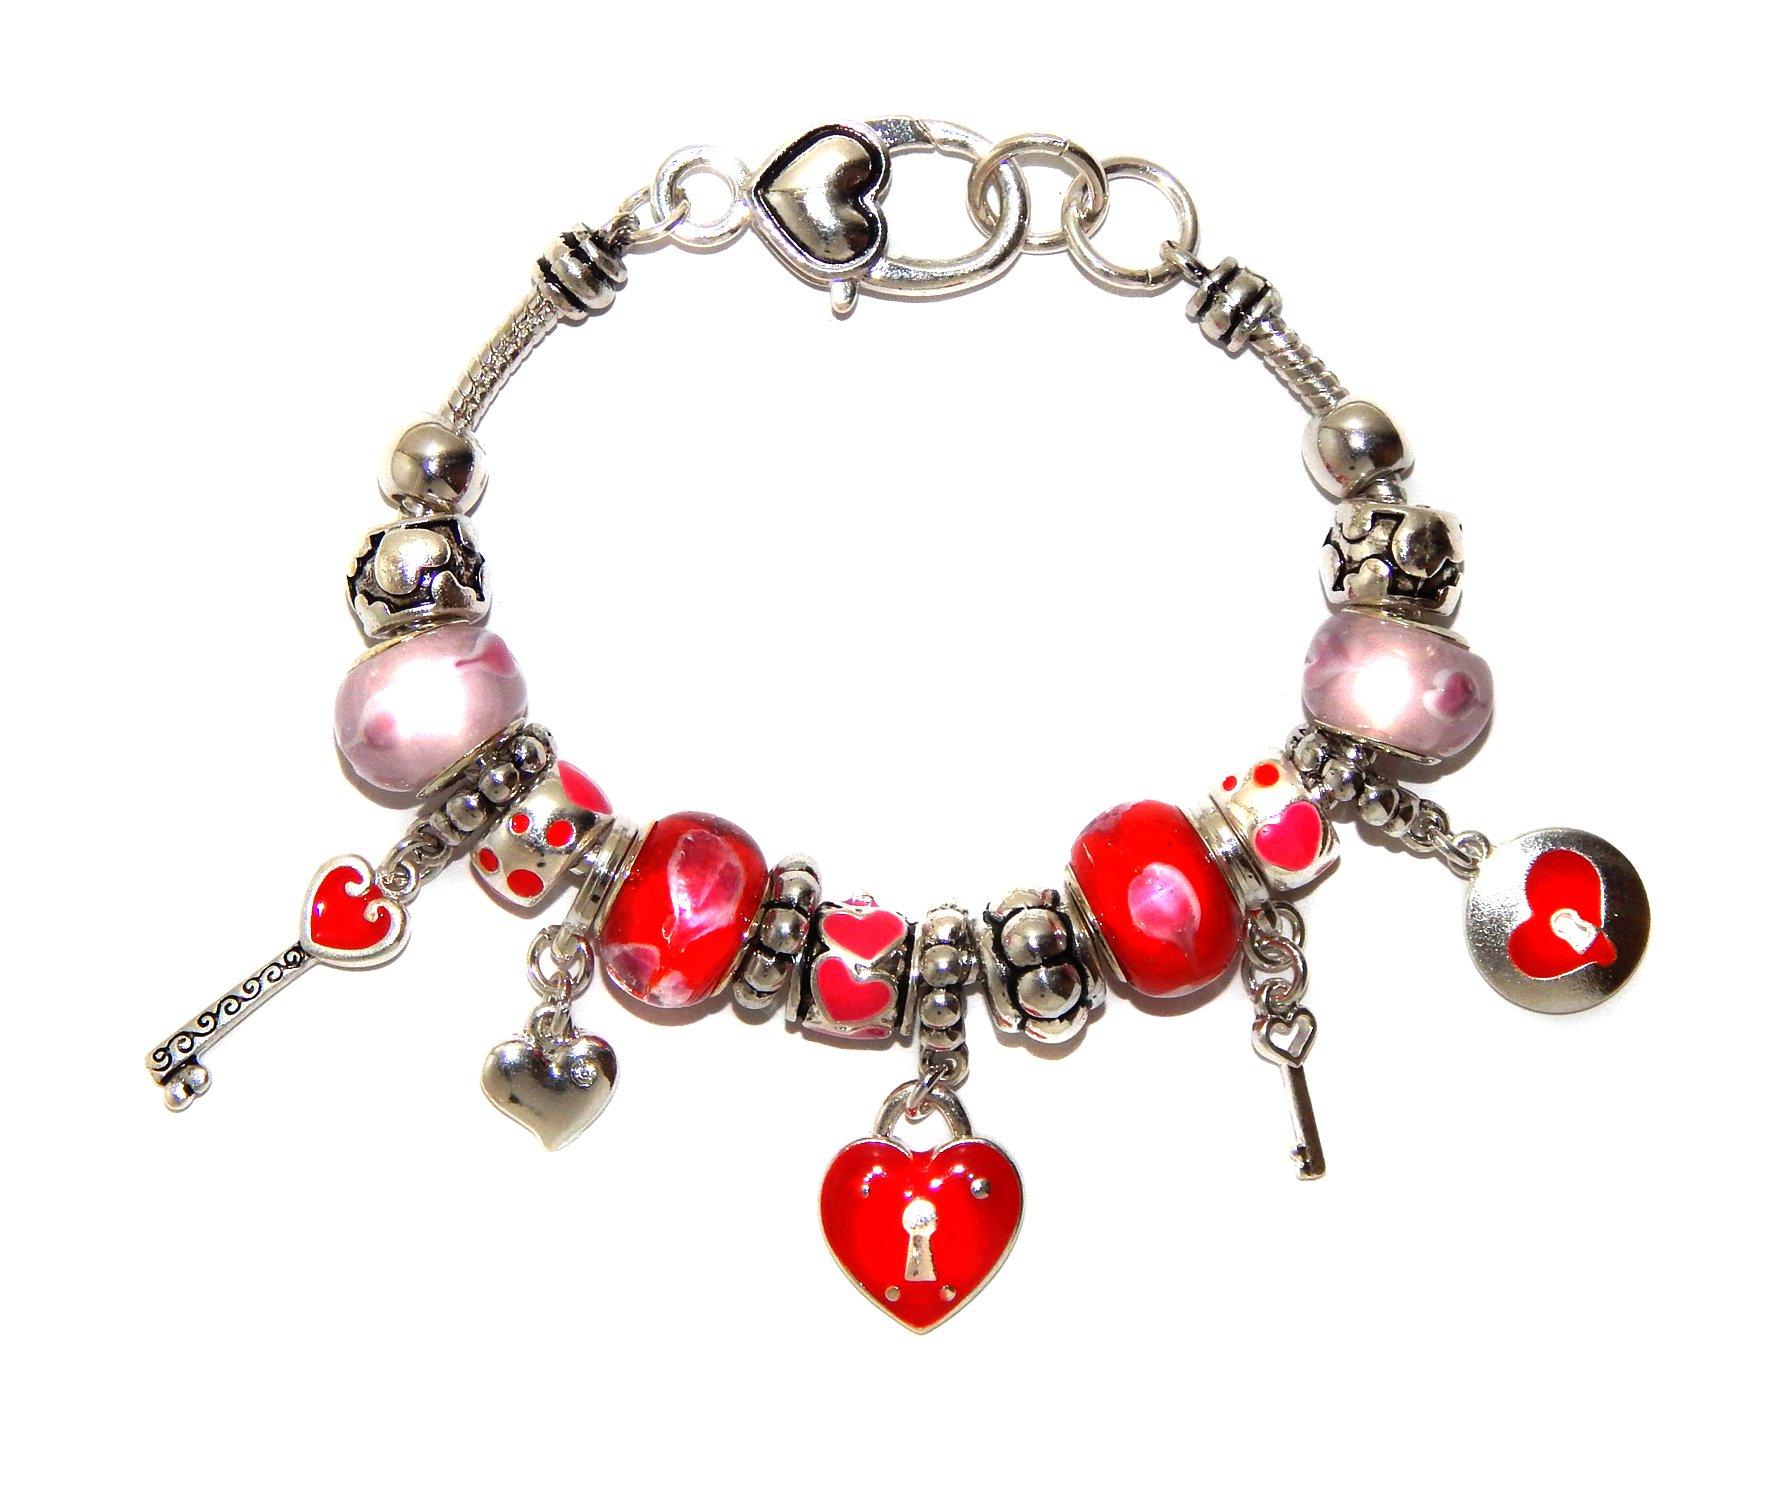 Landau Ambrosia Red Hearts Theme Charm Bracelet